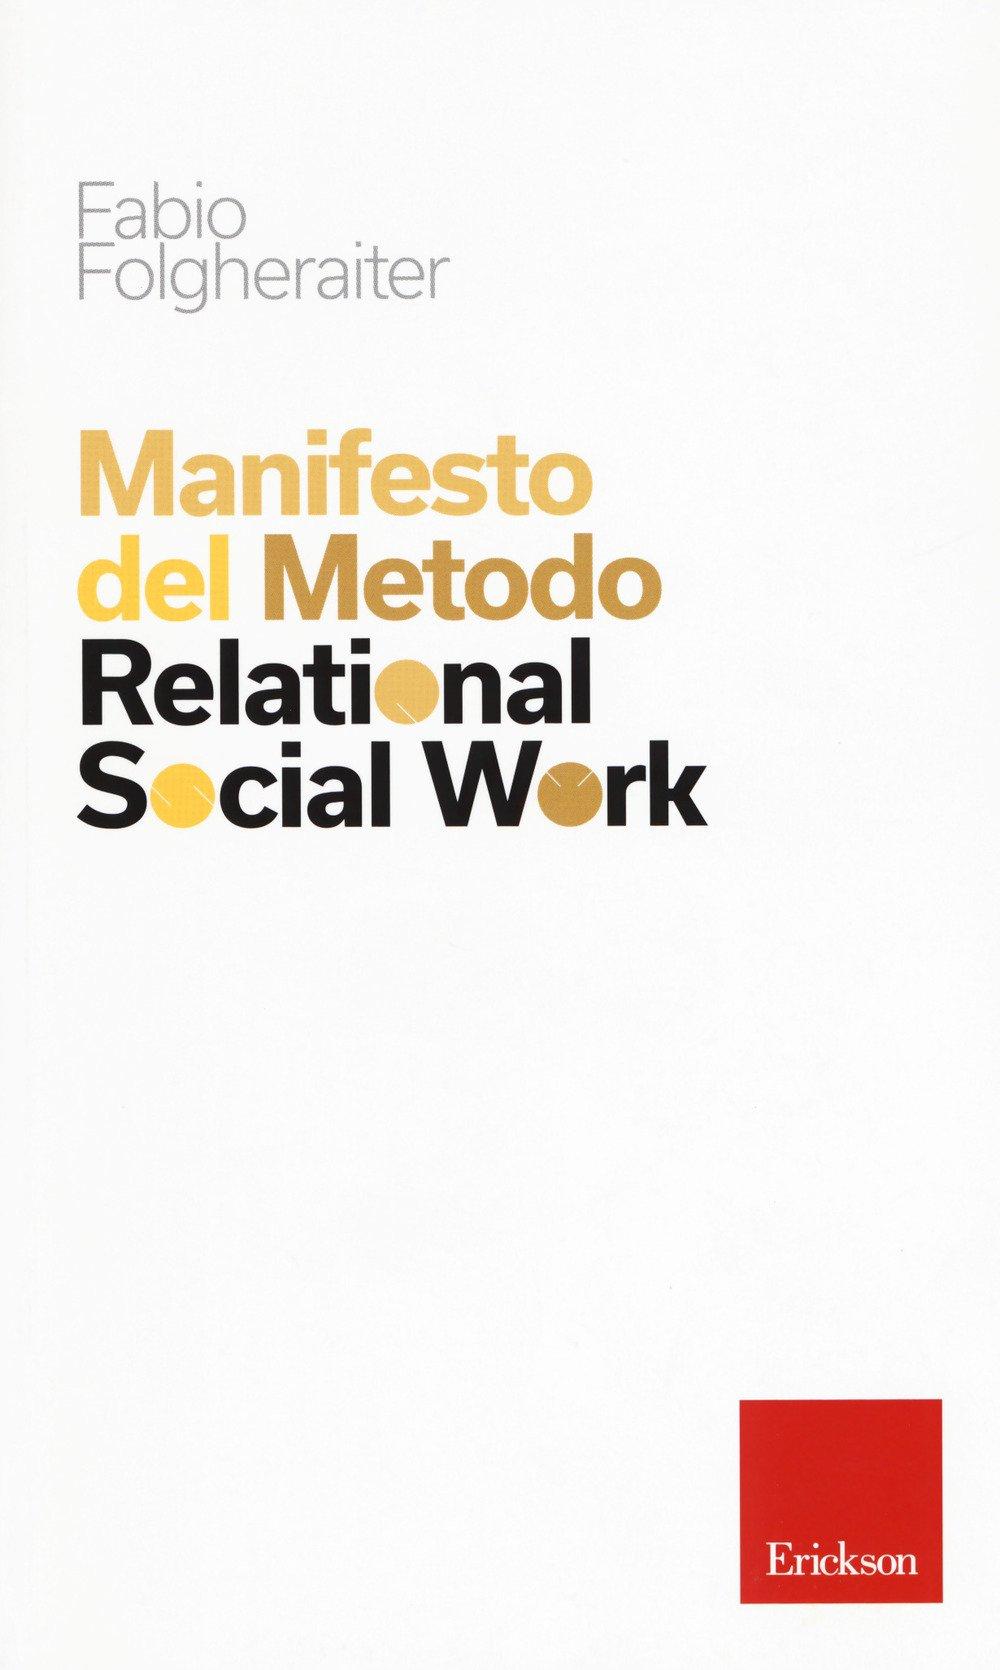 Manifesto del metodo Relational Social Work